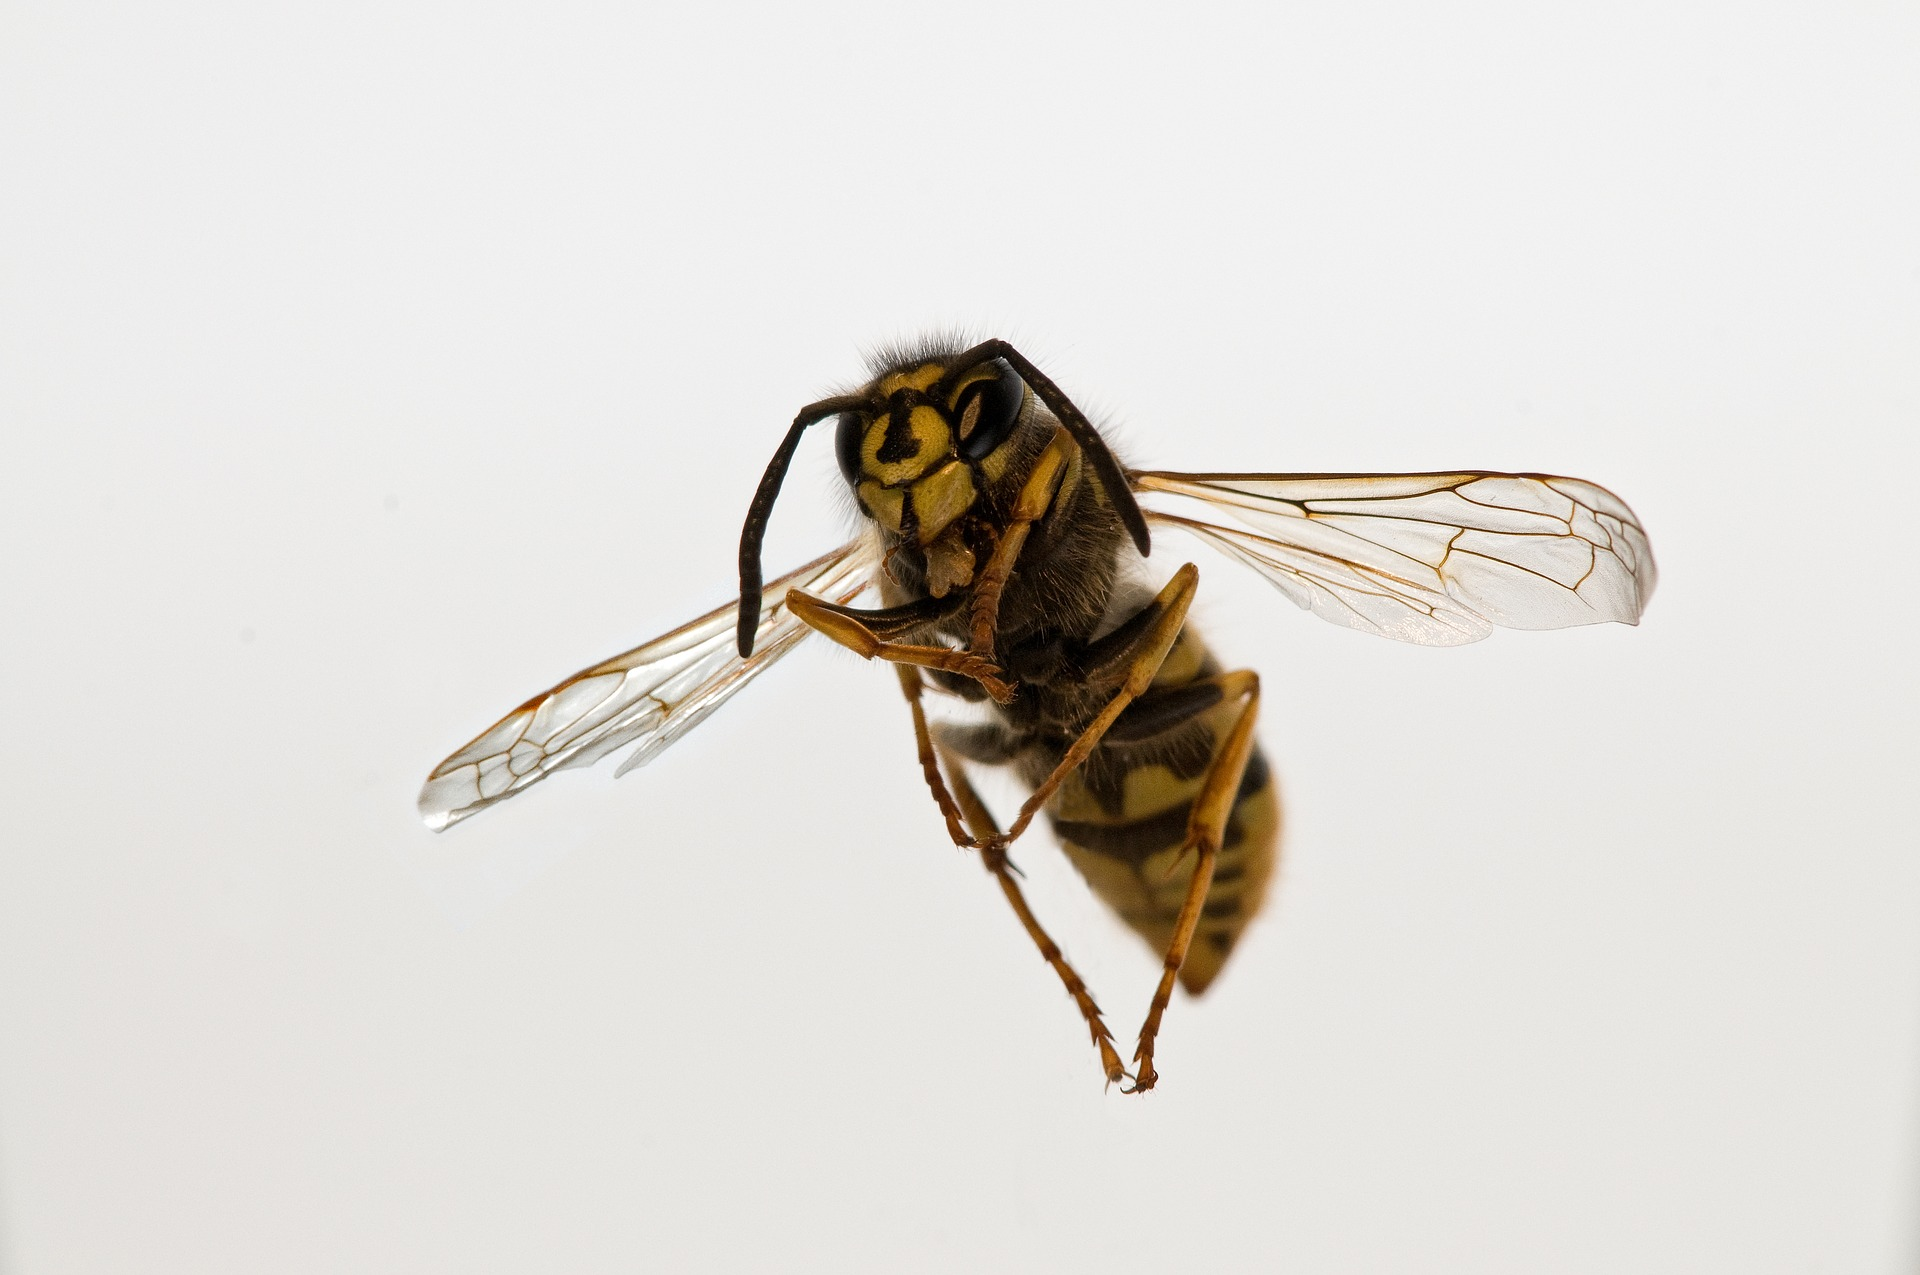 wespennesten